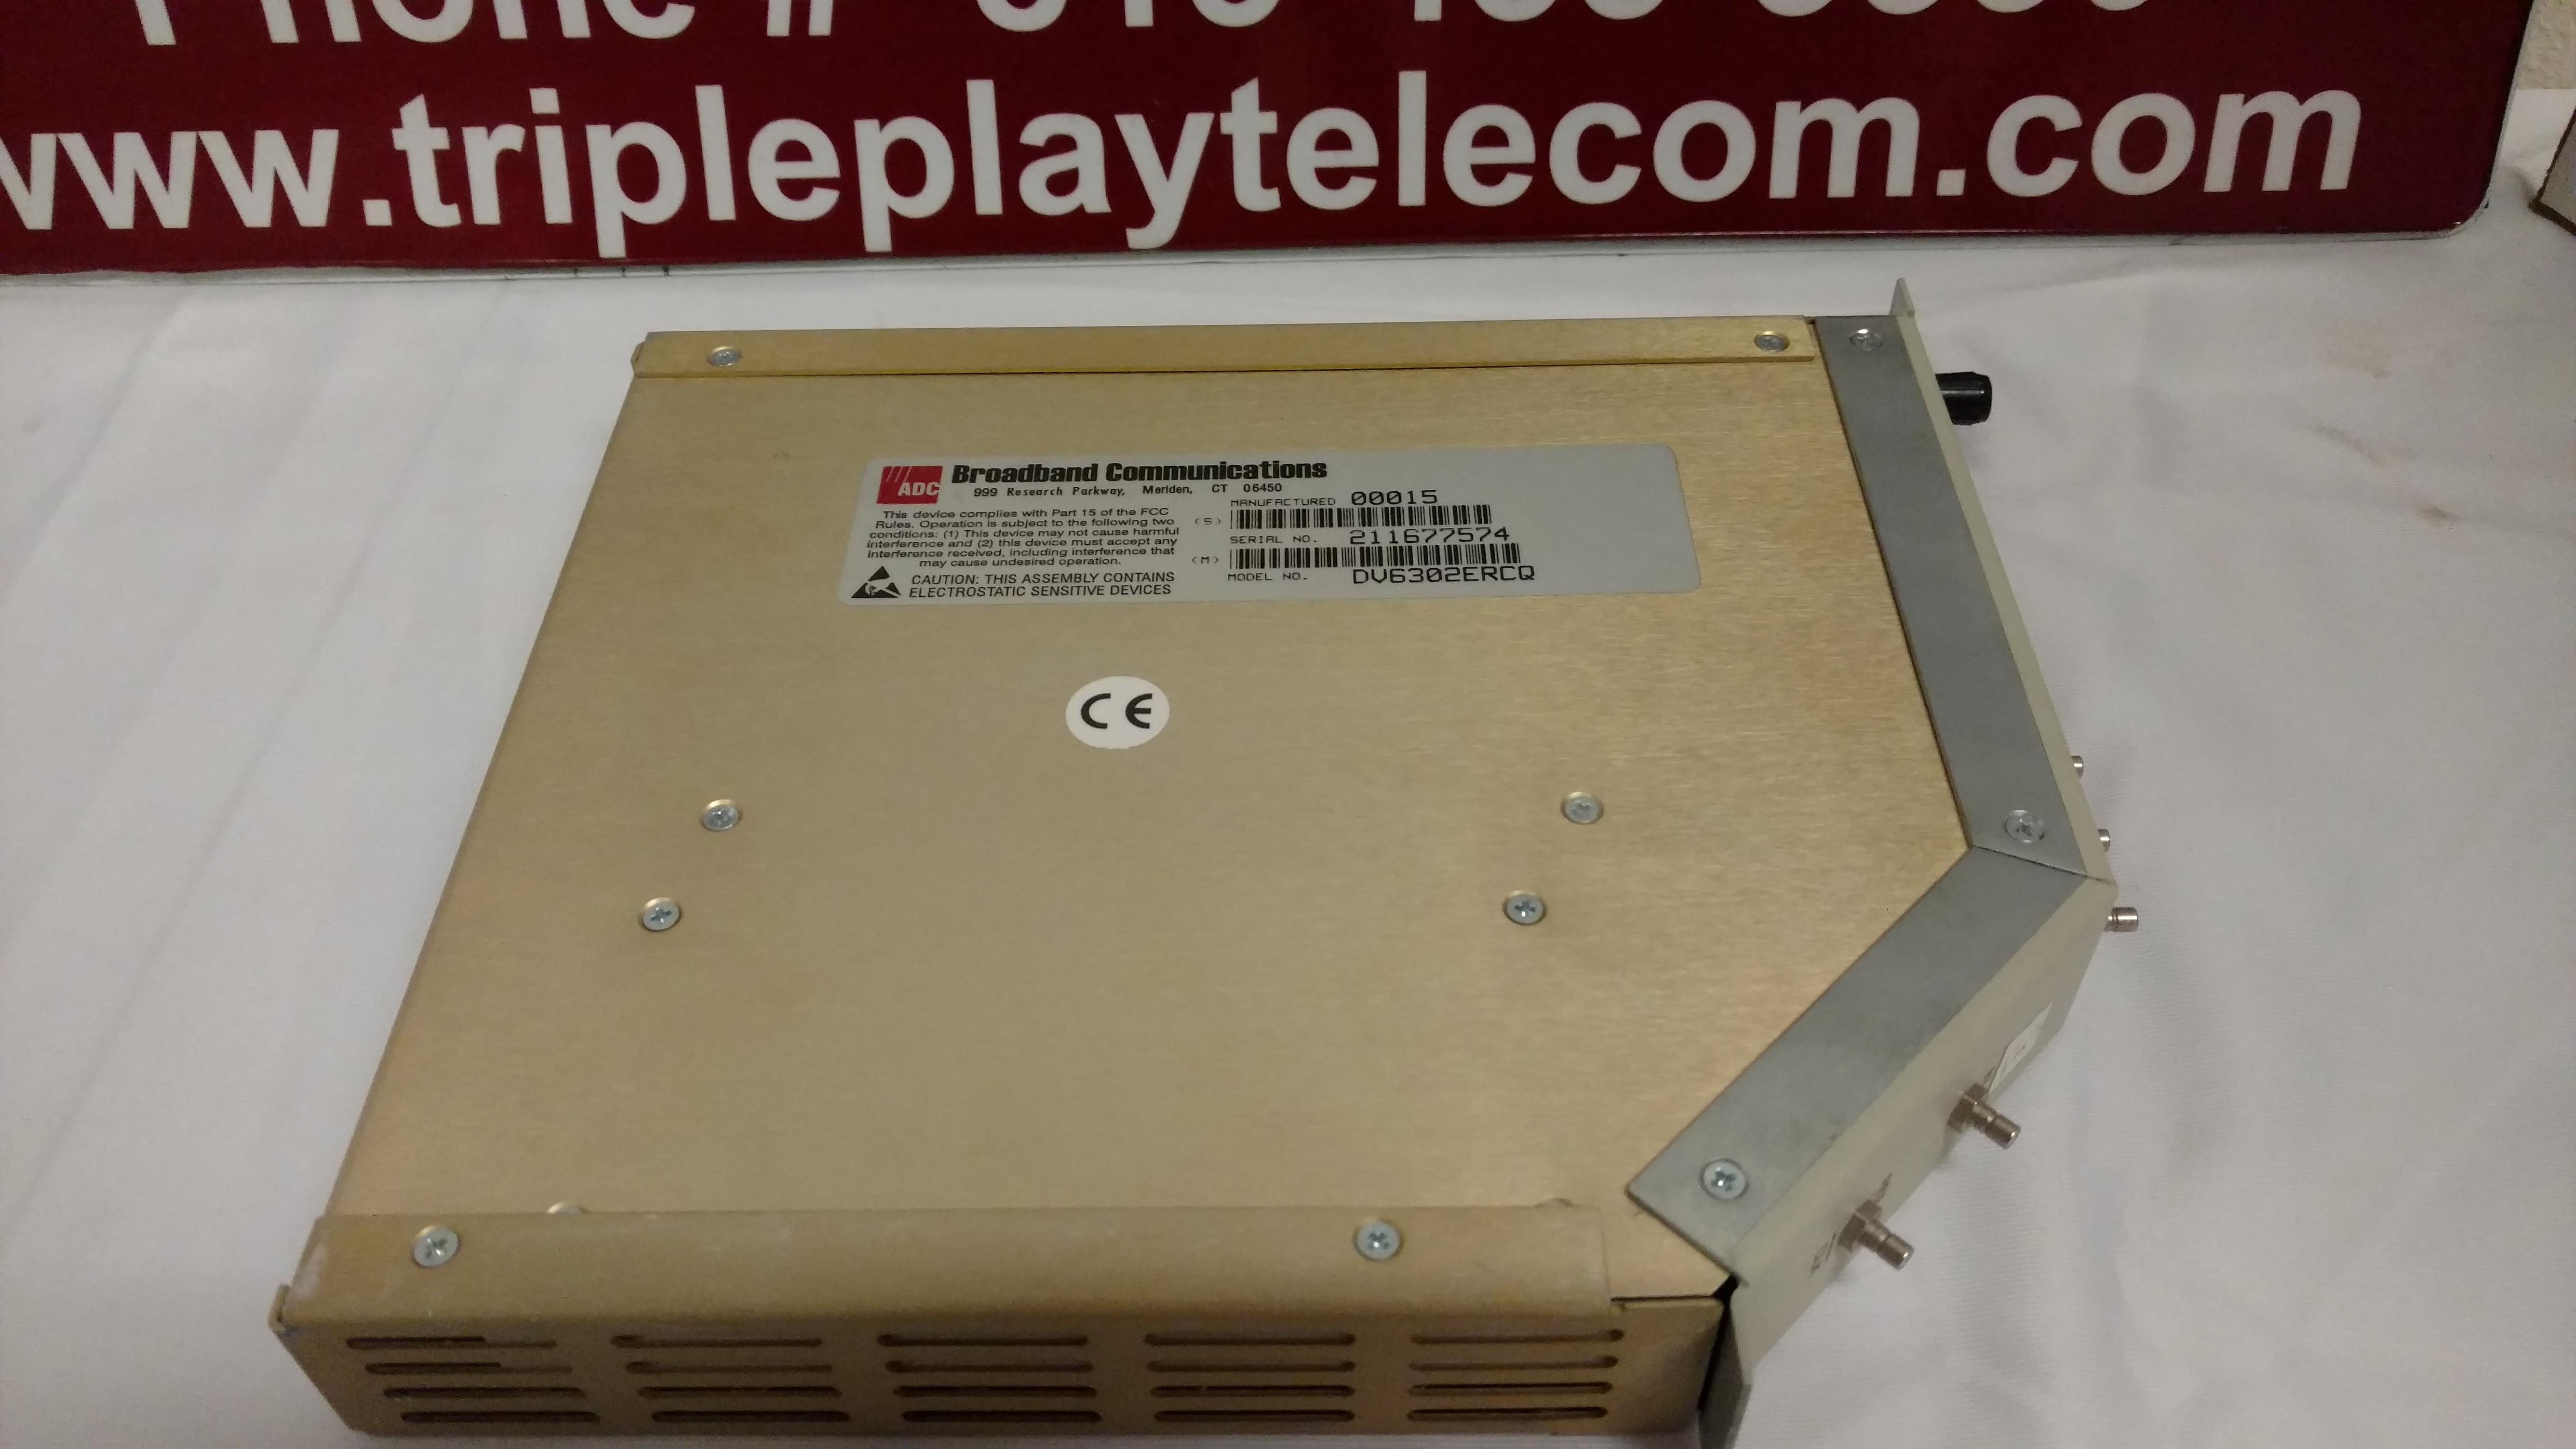 C-COR DV-6302-RCQ SM APD OPTICAL RECEIVER BROADBAND CARD VLTRBAB1AA Telecom